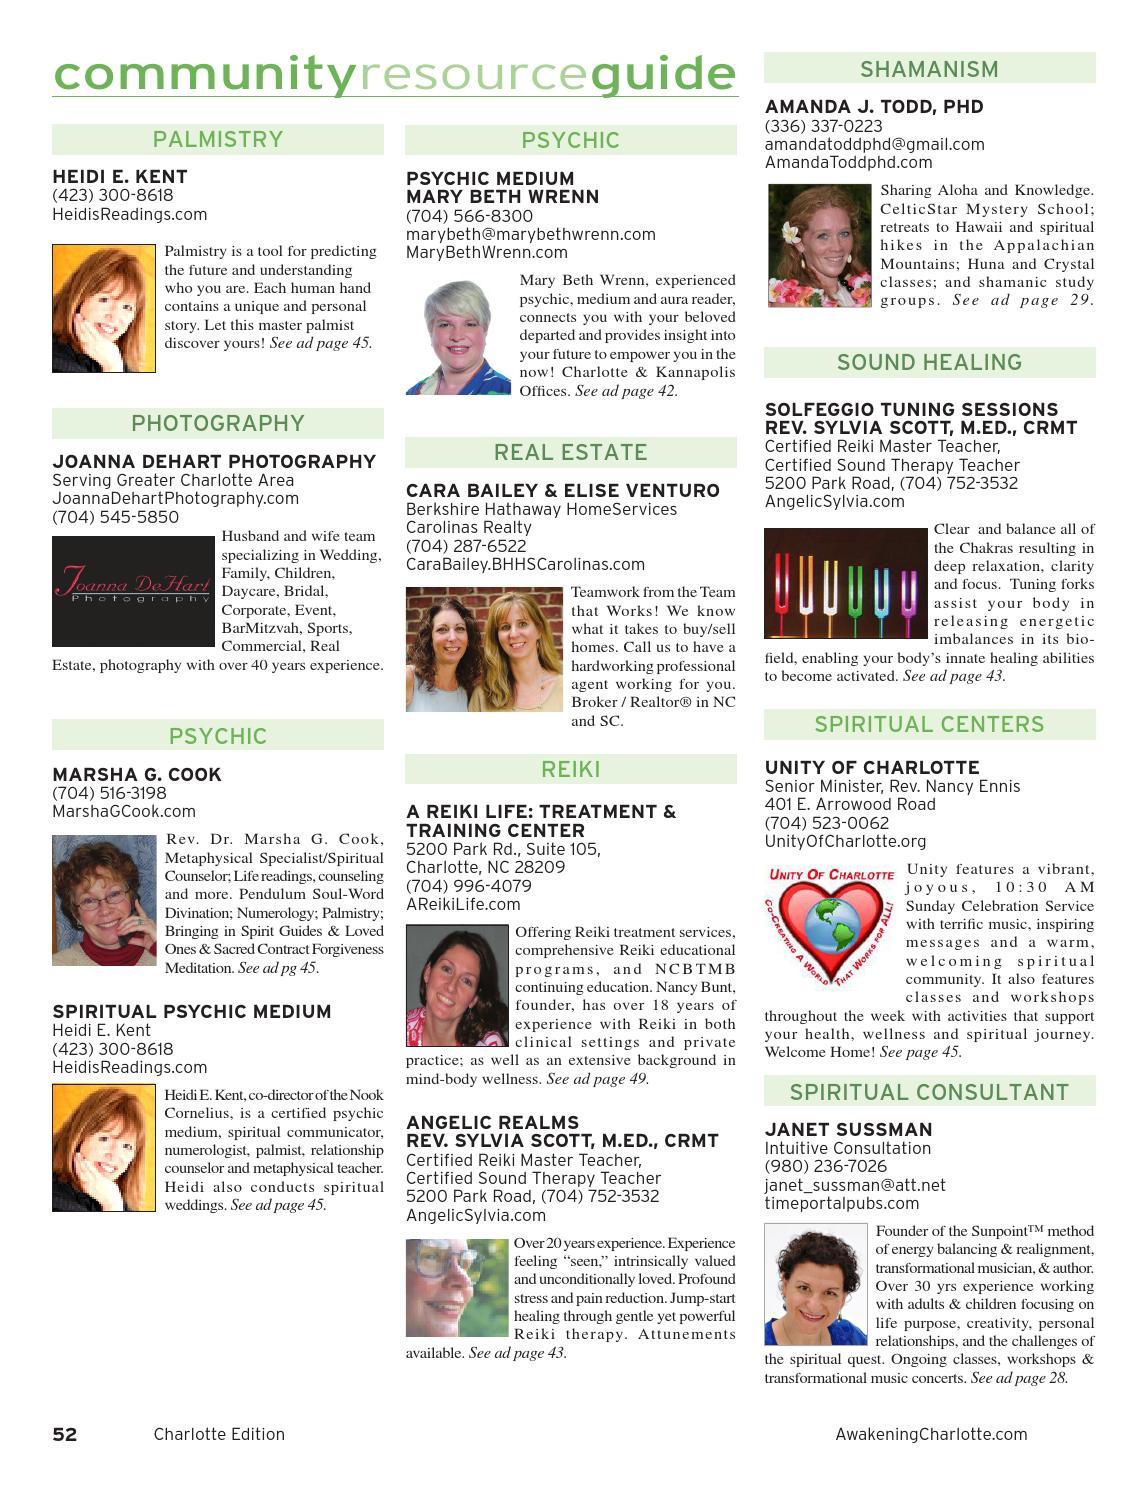 Natural Awakenings Magazine Charlotte Edition - February